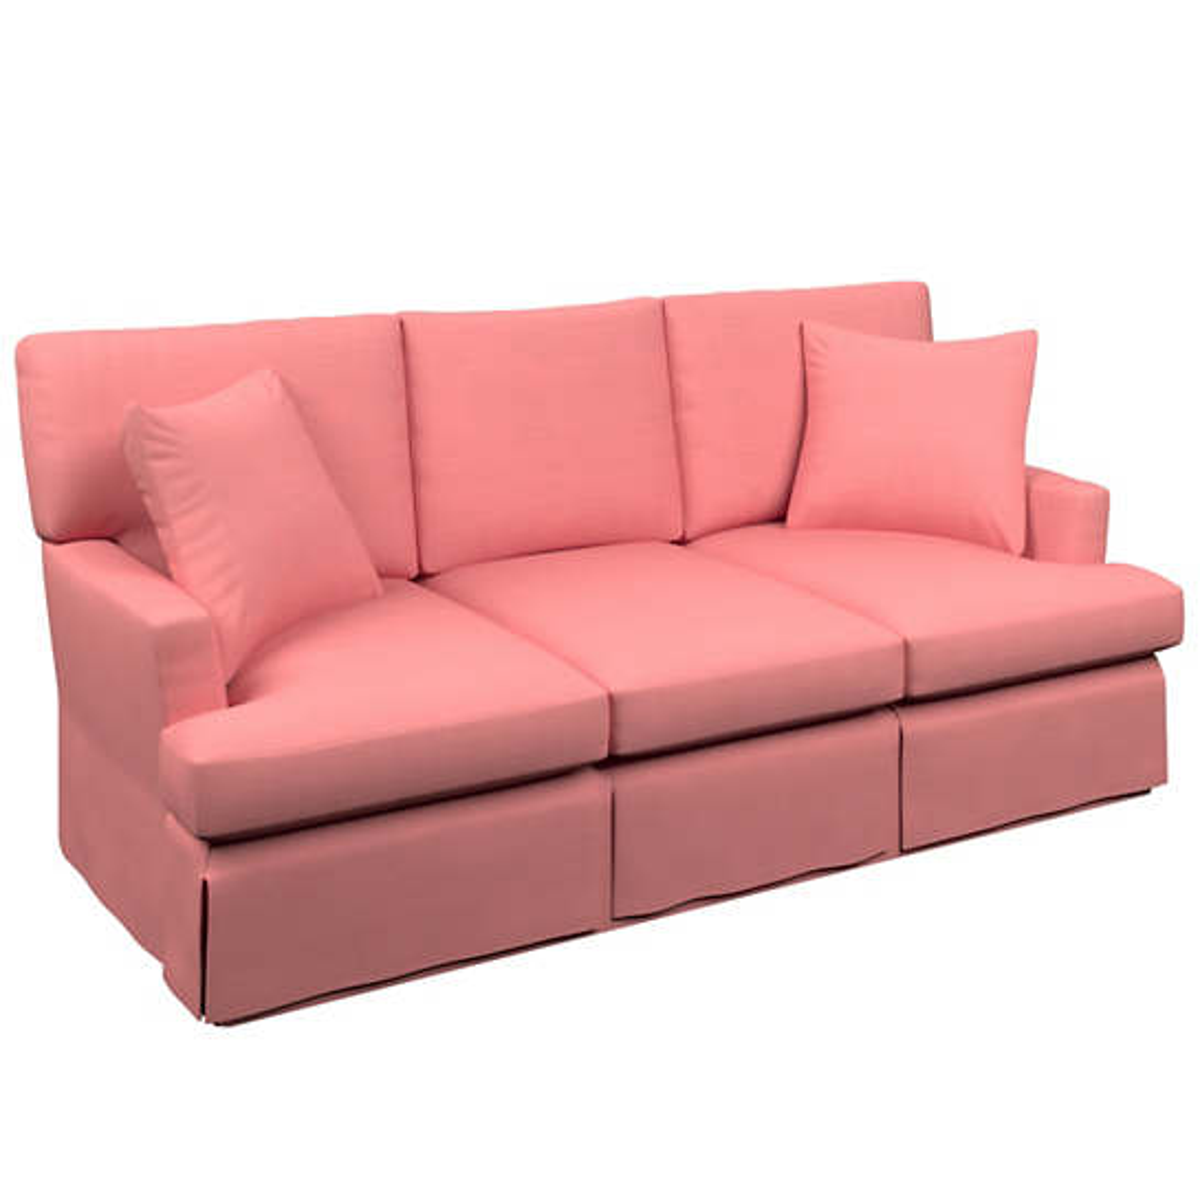 Estate Linen Coral Saybrook 3 Seater Upholstered Sofa